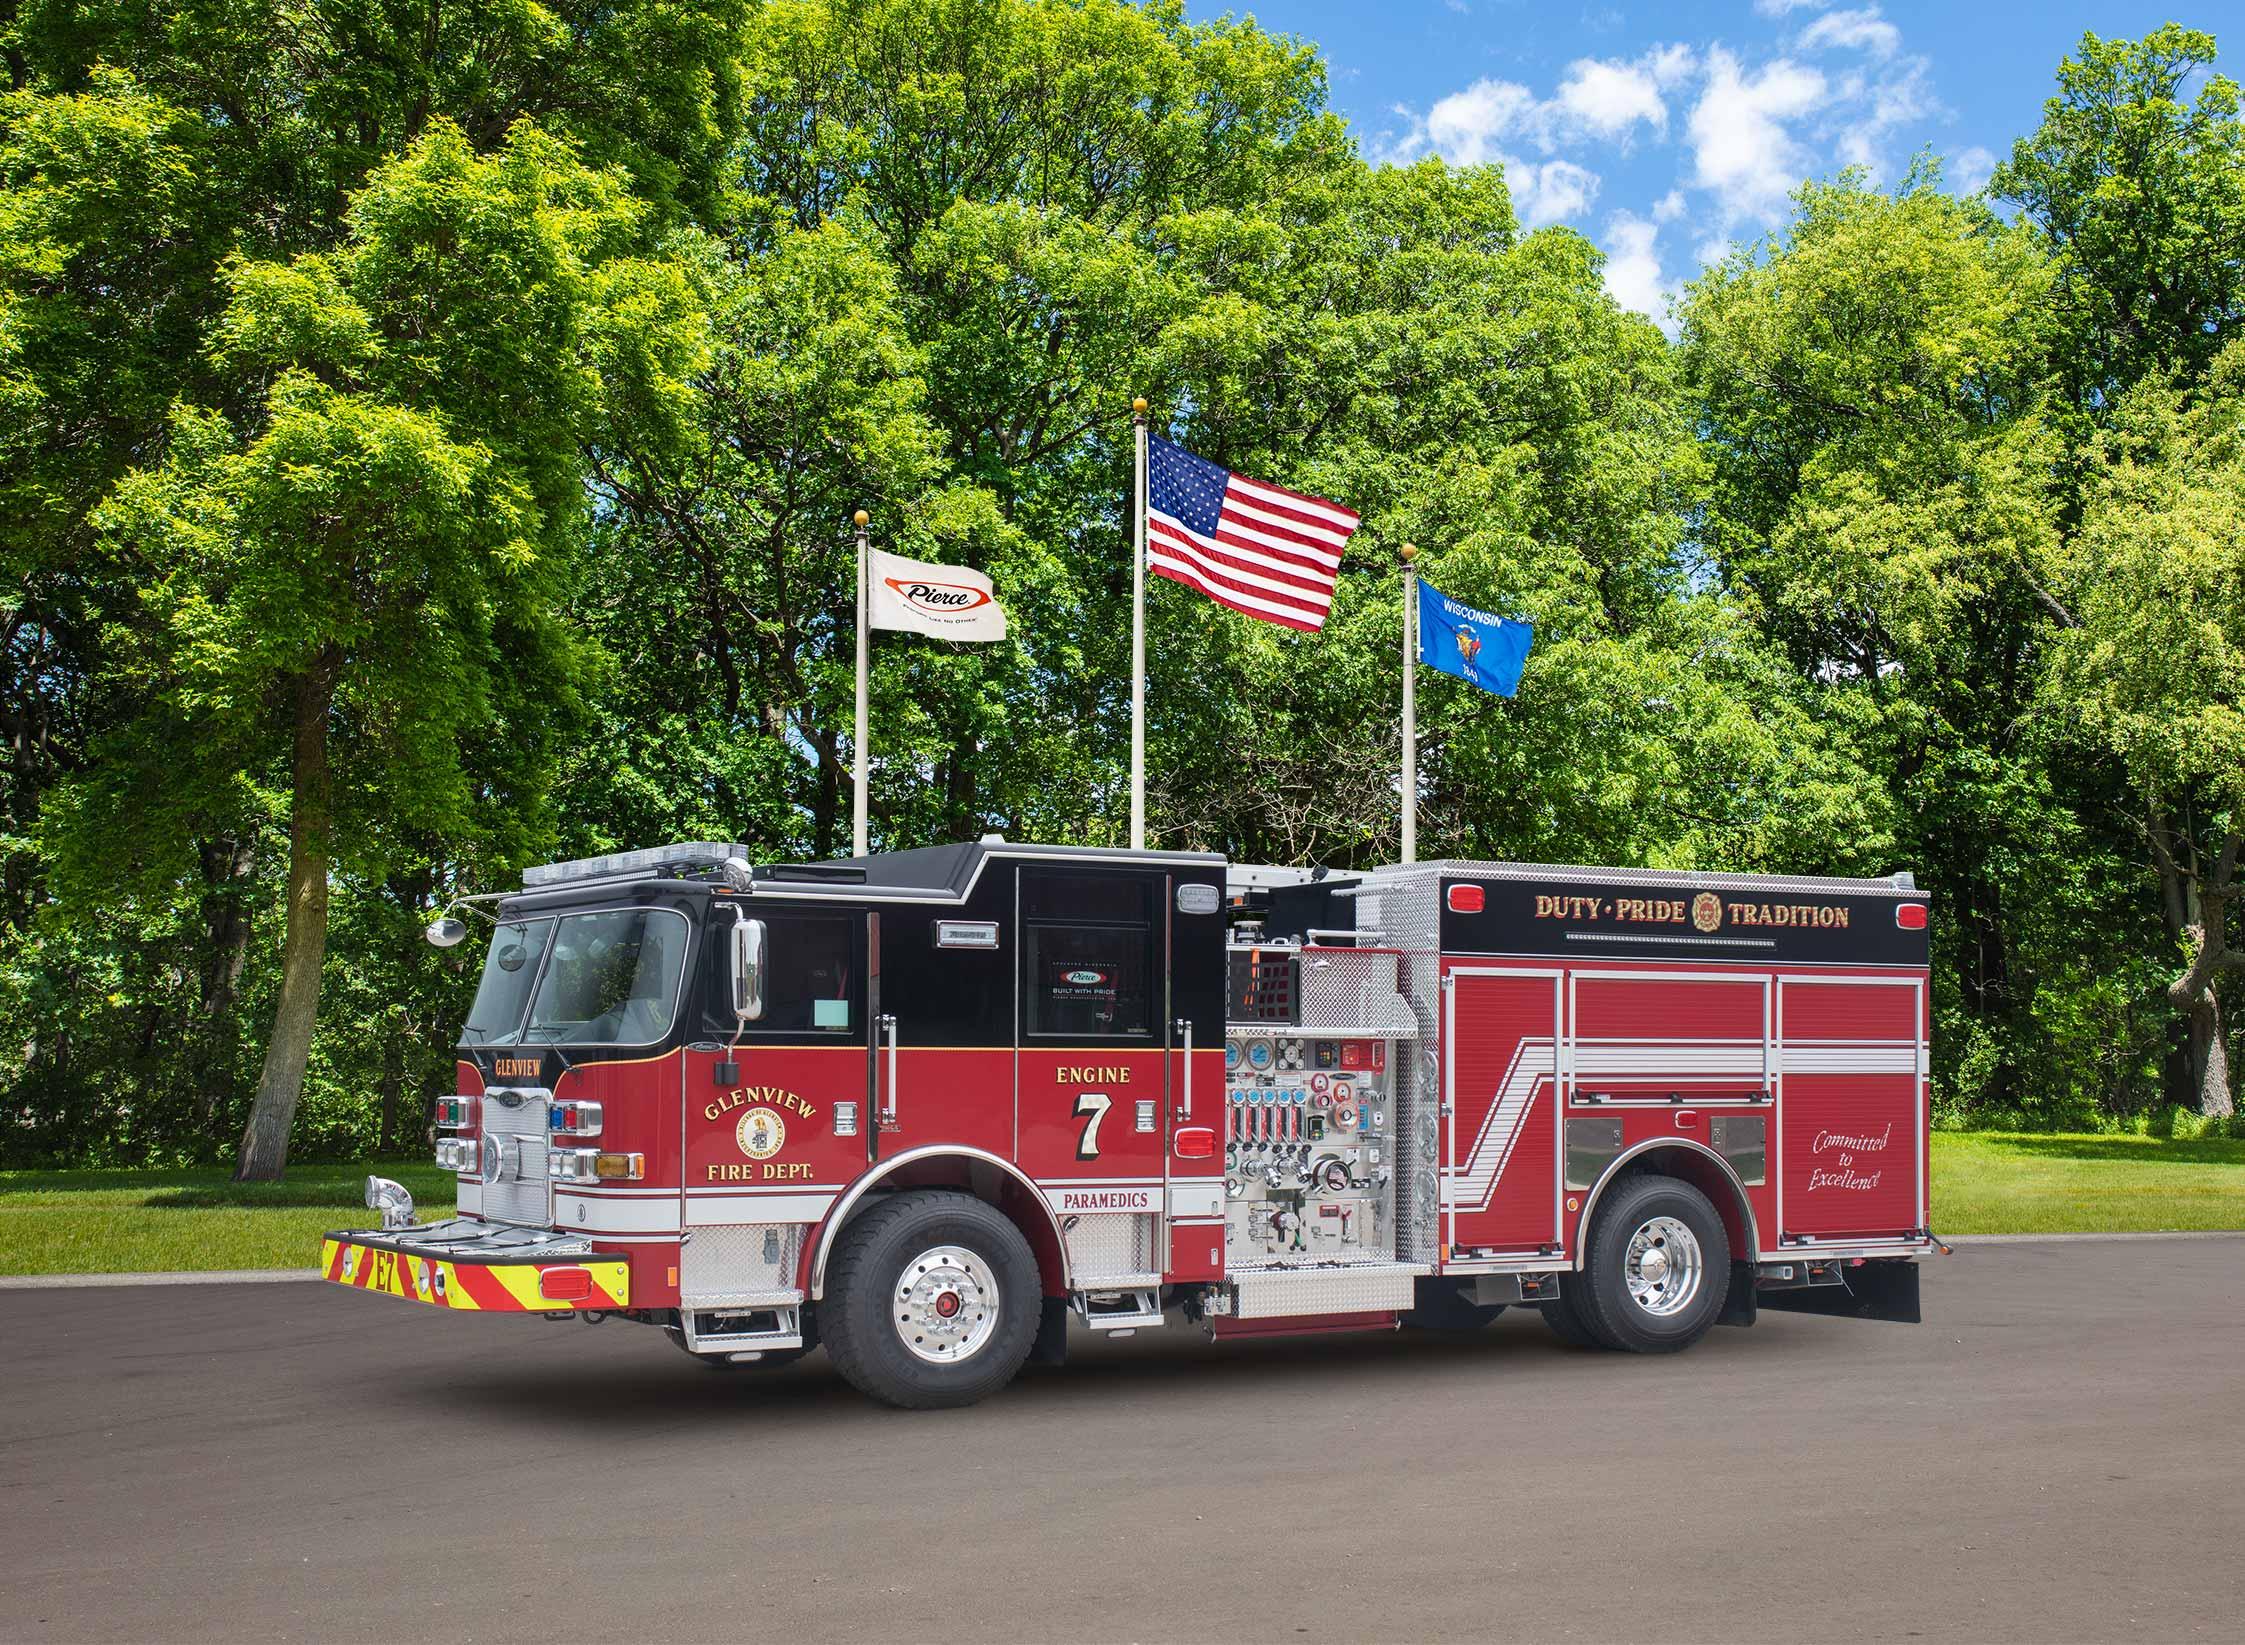 Glenview Fire Department - Pumper